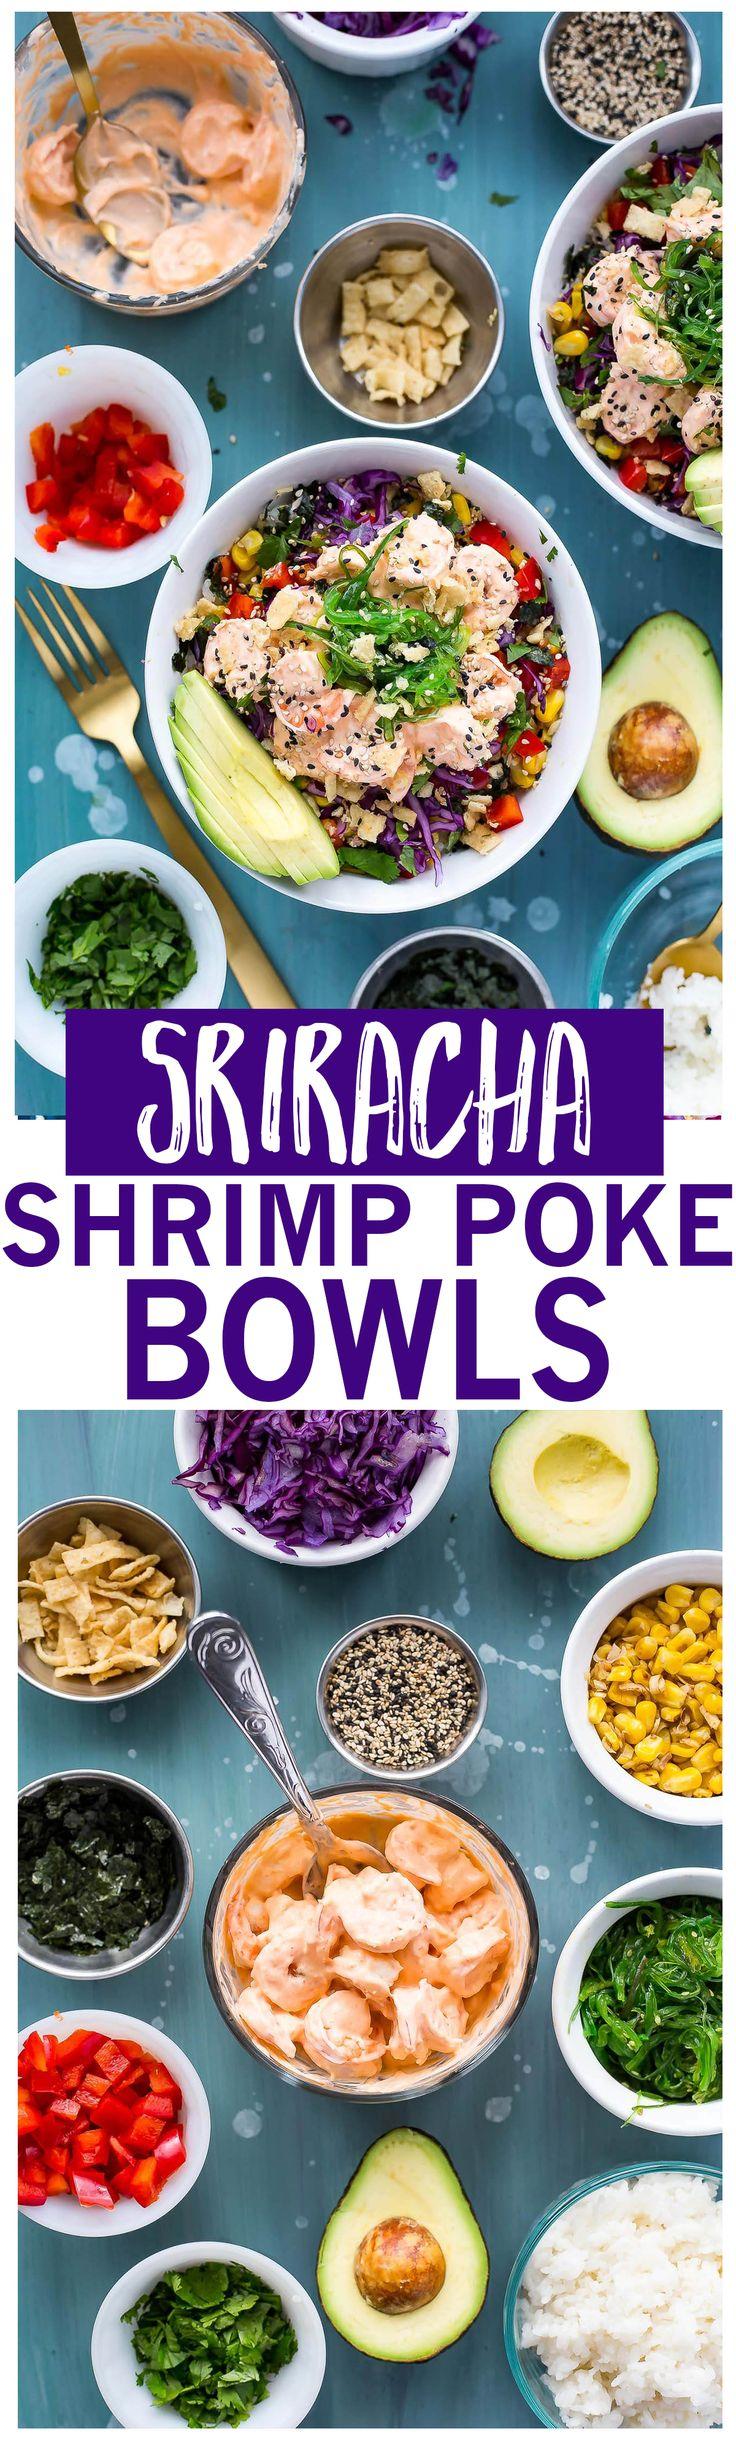 Creamy Sriracha Shrimp Poke Bowls are a delicious twist on traditional tuna poke with seaweed salad, lemongrass corn, avocado and wonton strips!